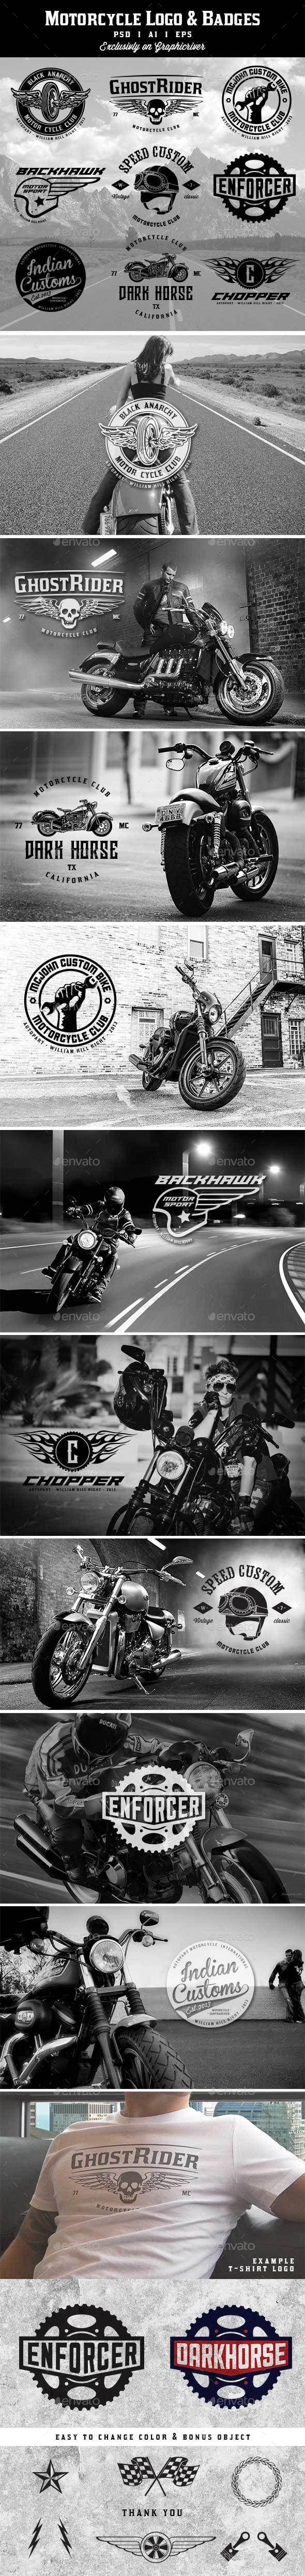 Motorcycle Logo & Badges Template #design Download: http://graphicriver.net/item/motorcycle-logobadges/13133907?ref=ksioks